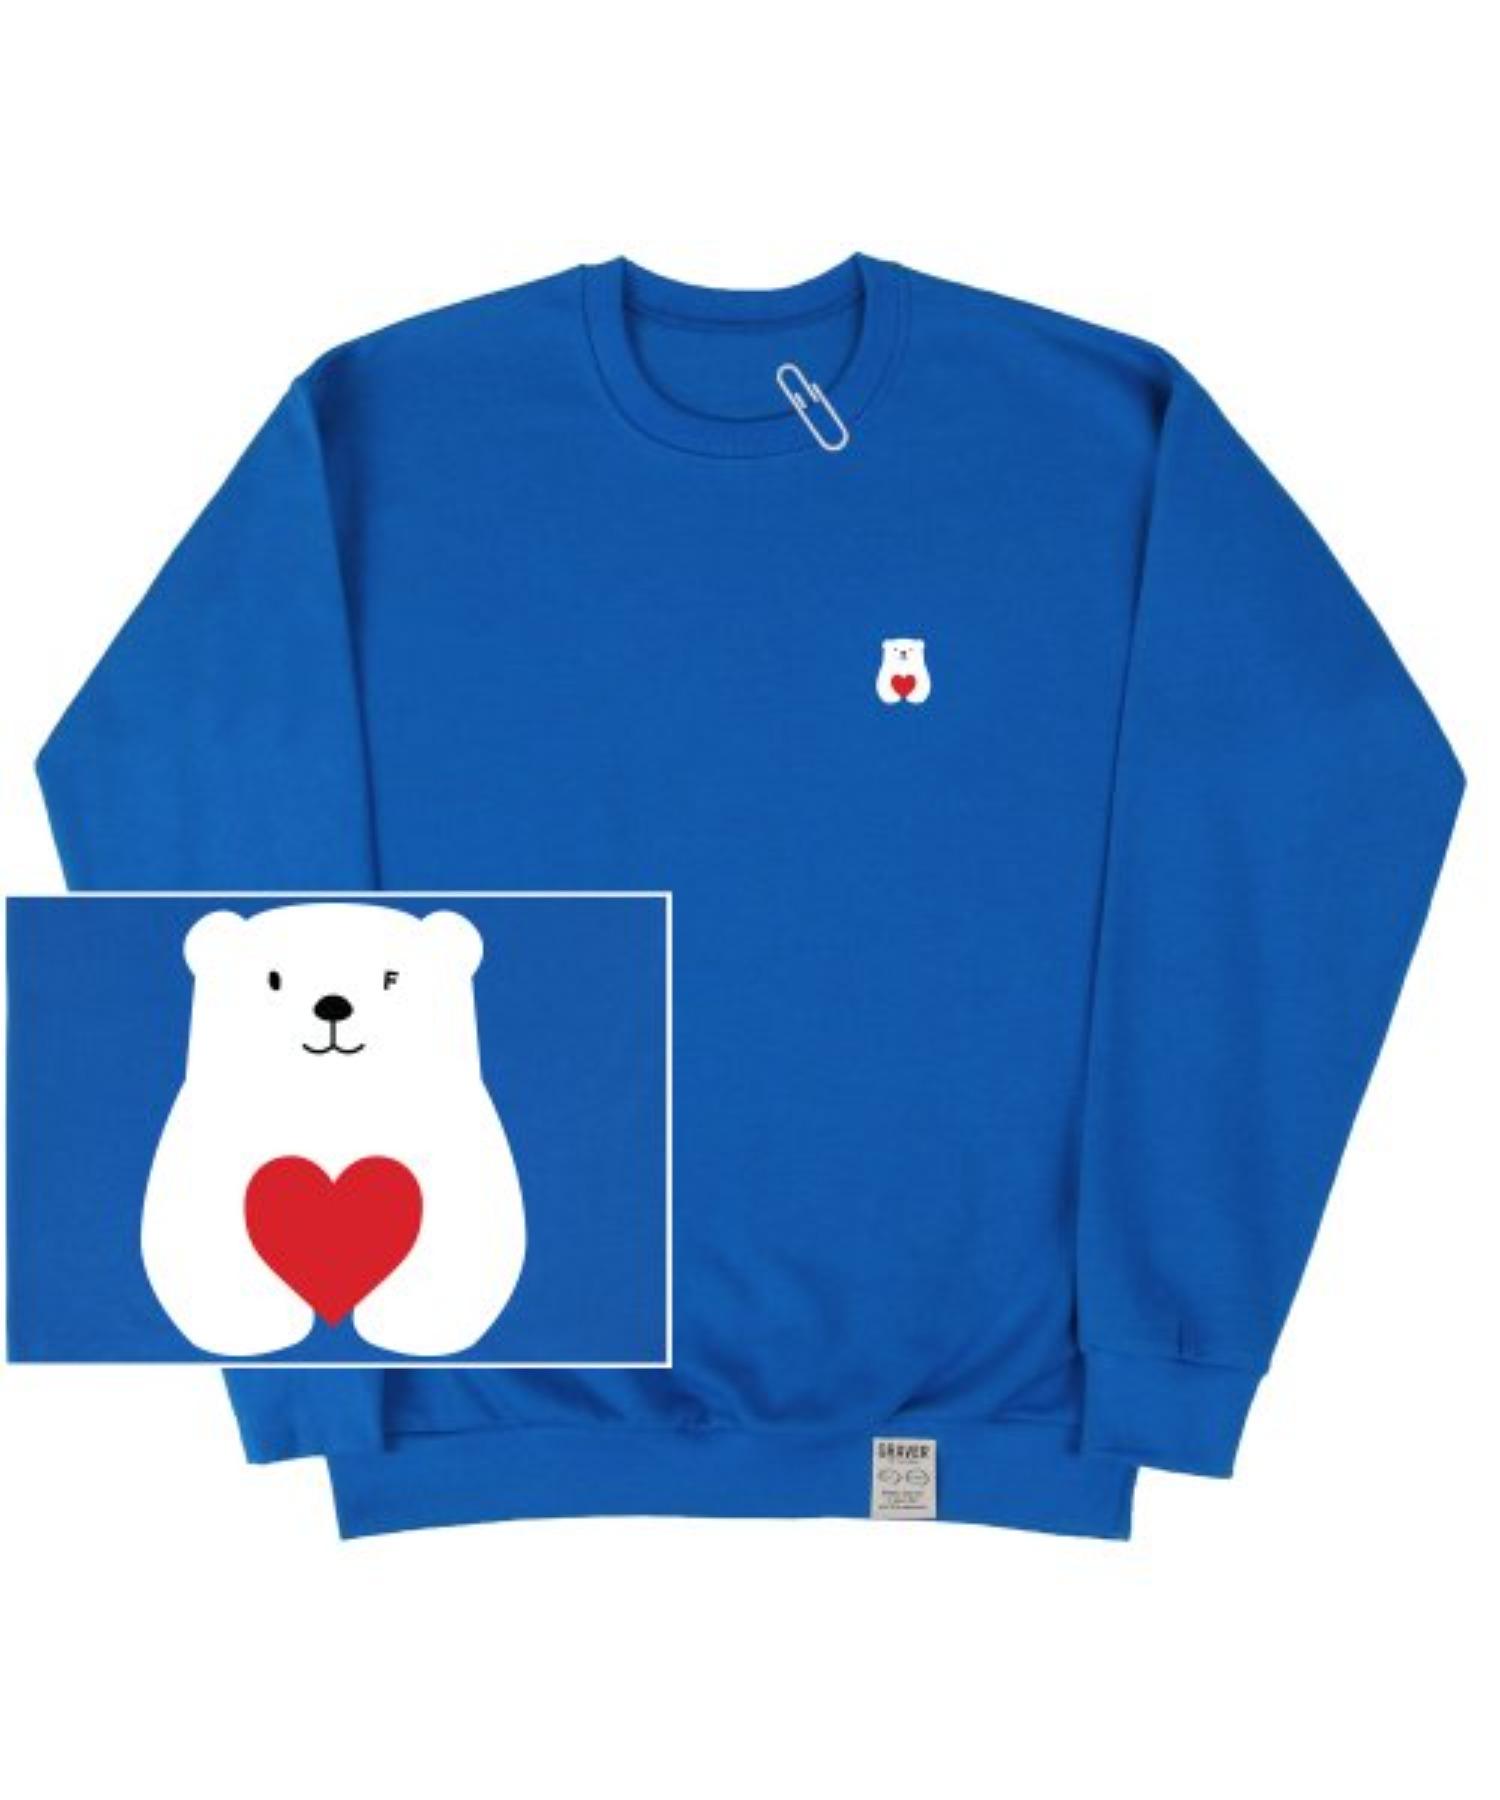 [UNISEX] Small Polar Bear Red Heart White Clip Sweatshirt_Cobalt Blue